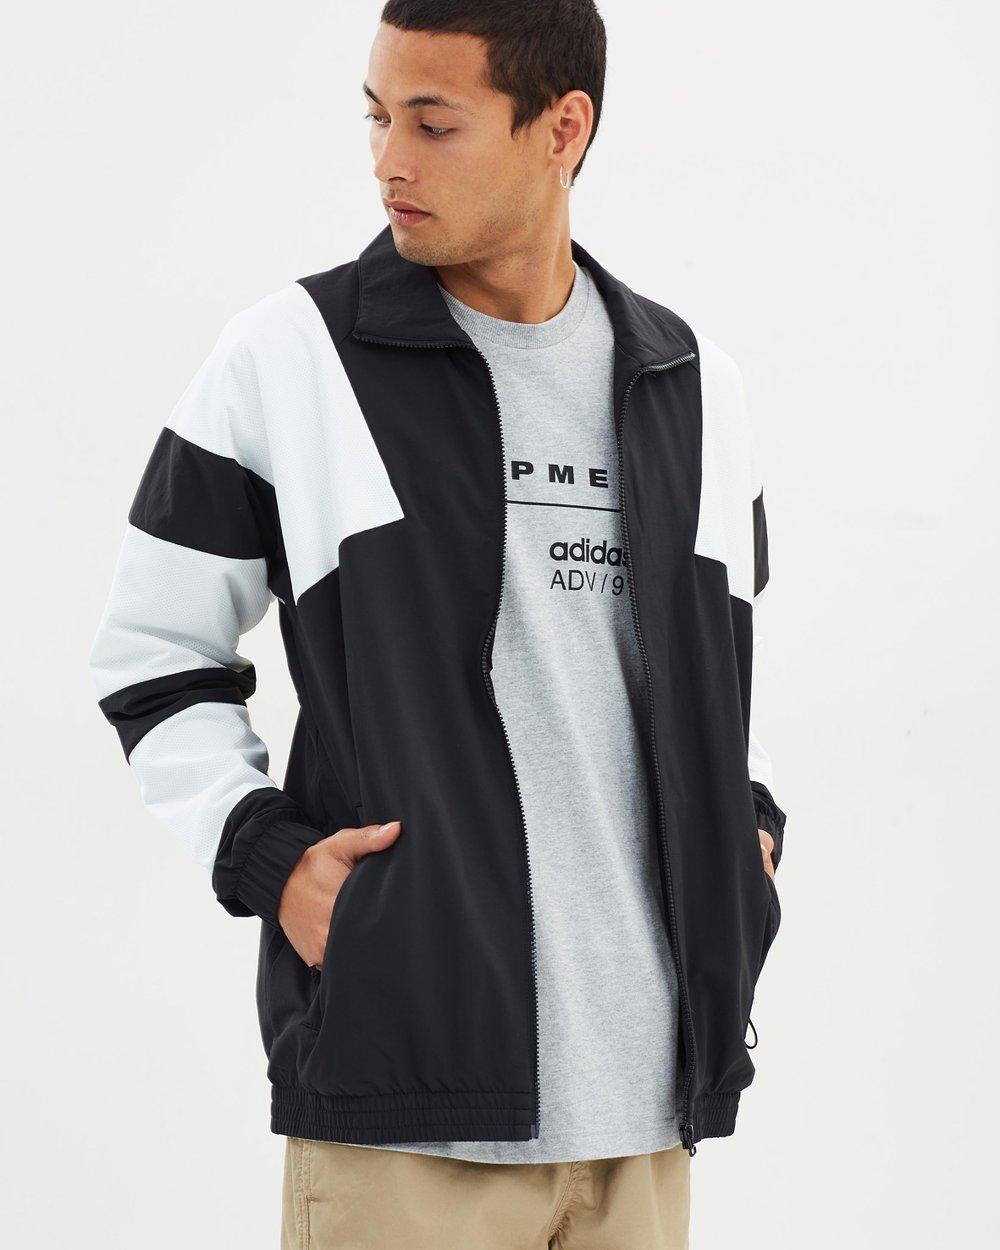 promo code 829c9 ec1ce ... EQT Bold 2.0 Track Jacket by adidas Originals Online THE ICONIC  Australia ...